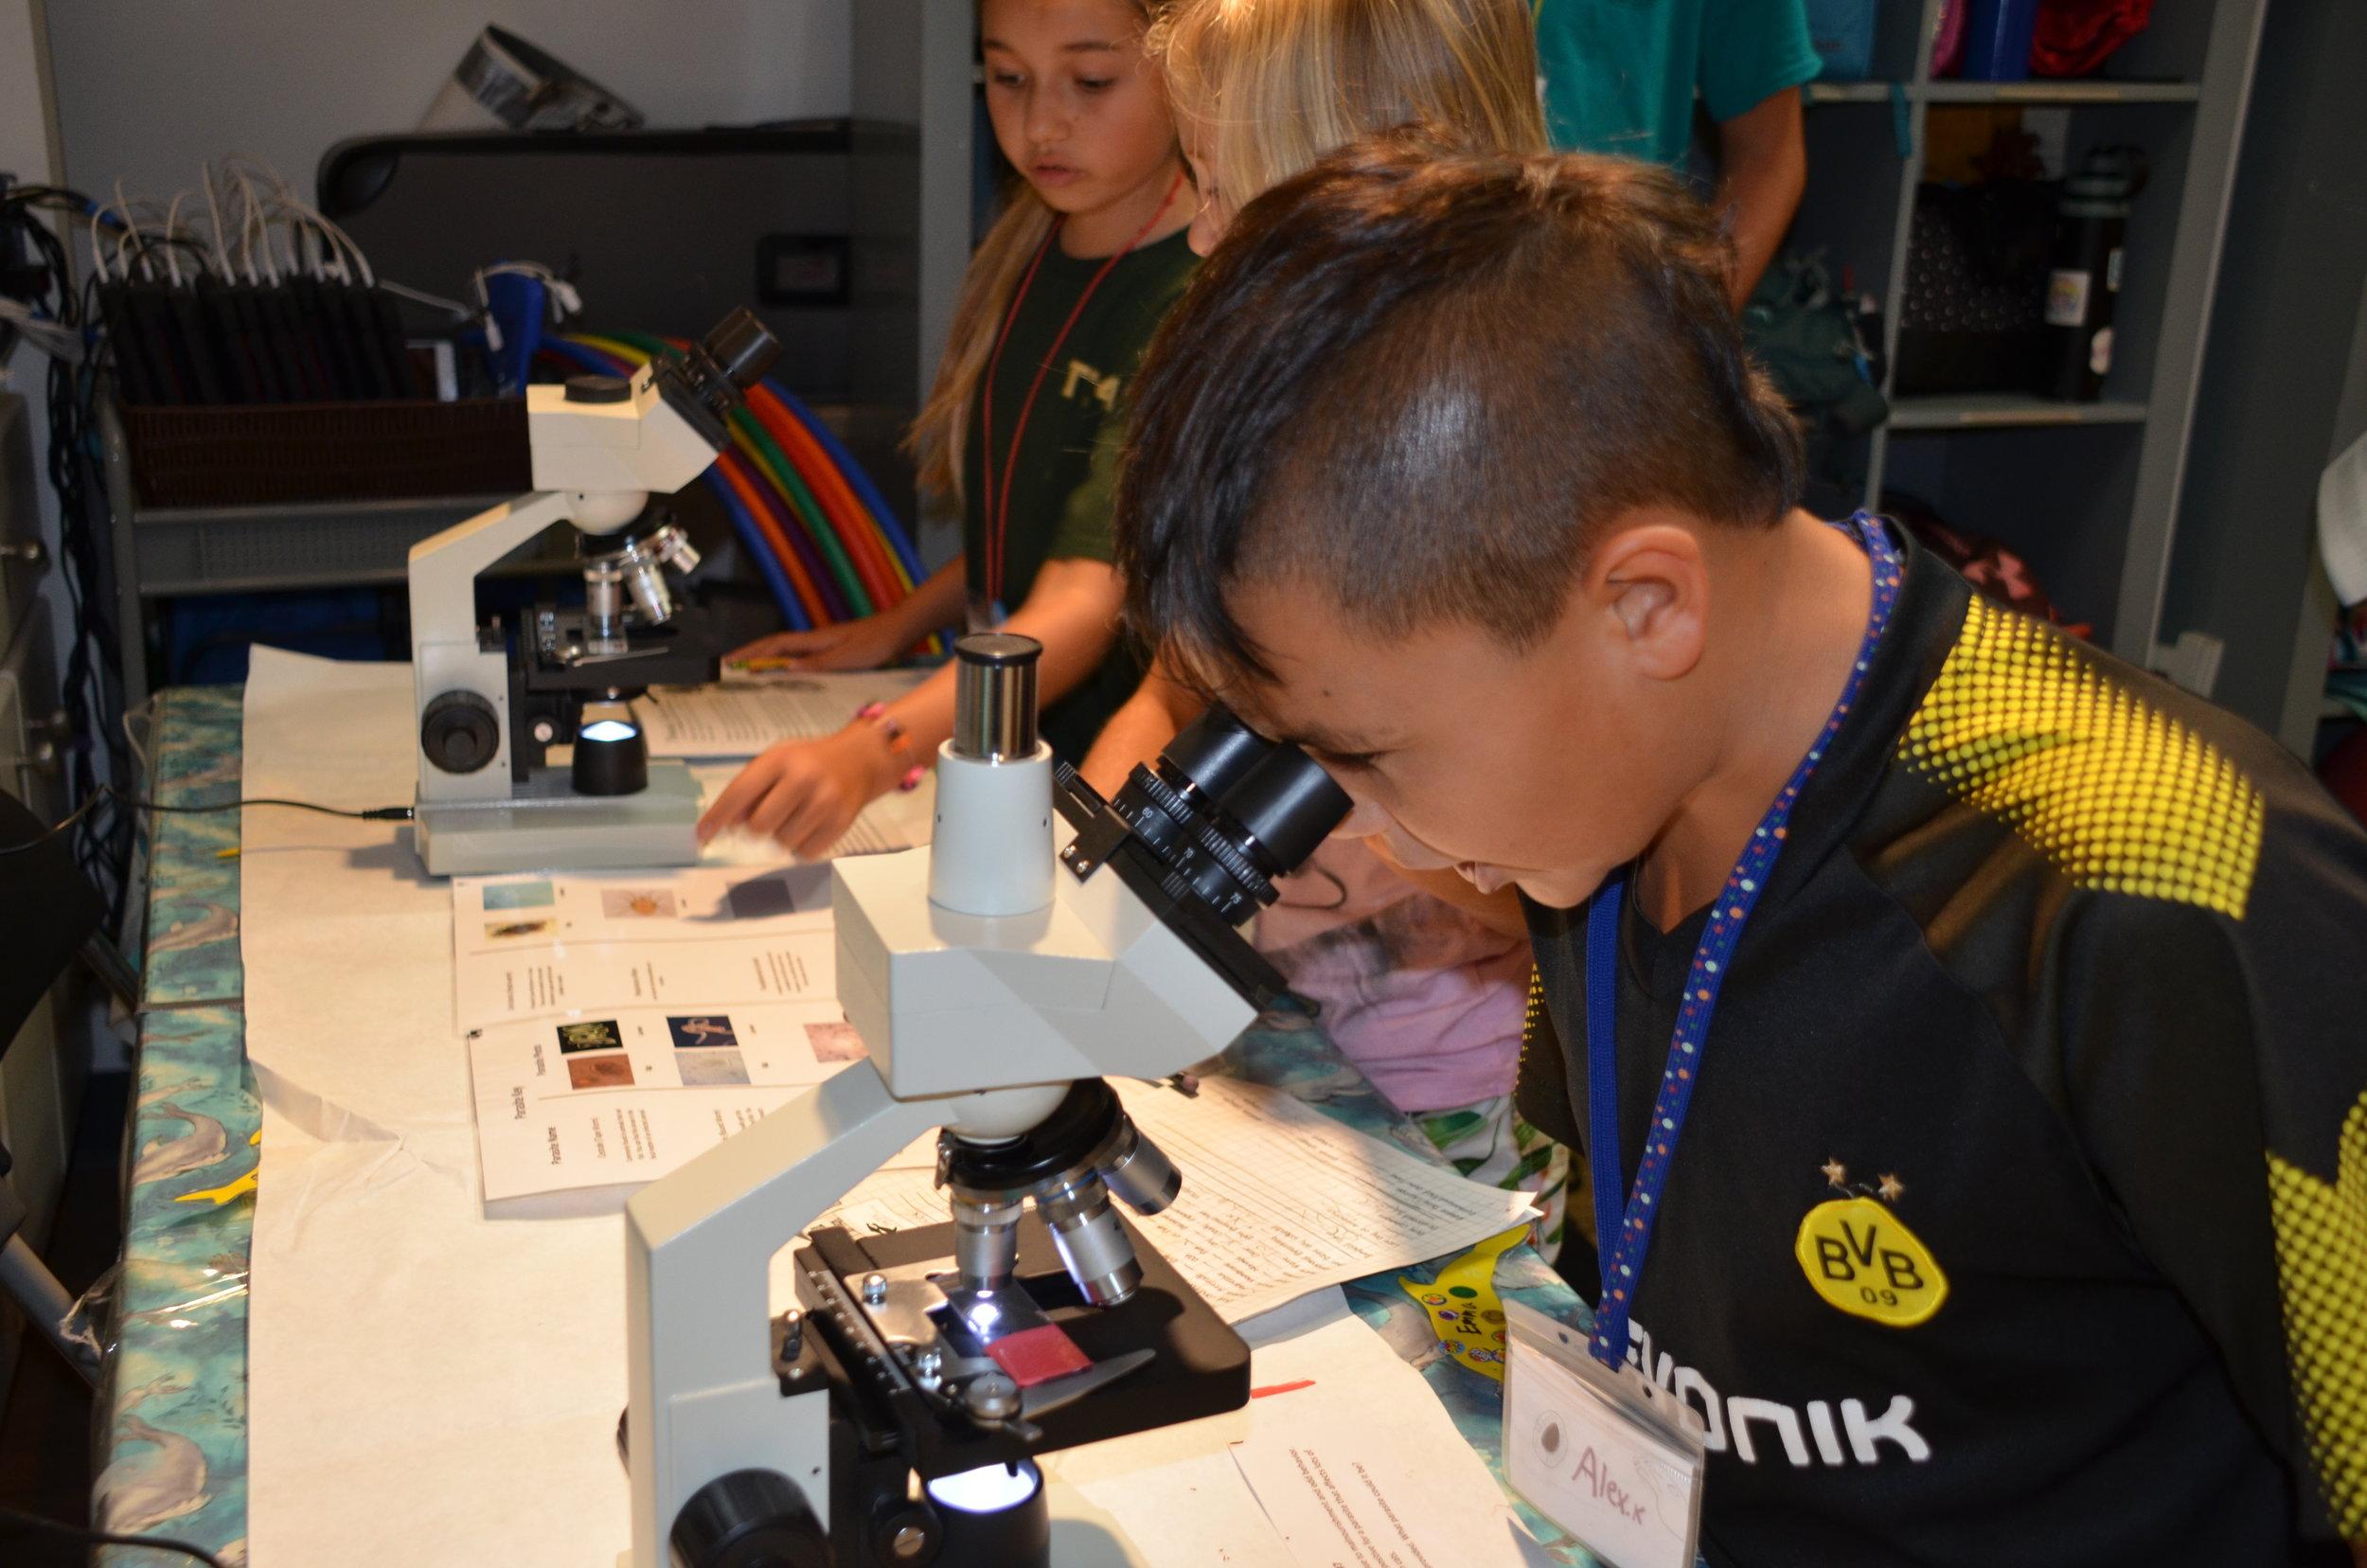 Camp Pinniped Microscopes 7-23-19 011.JPG